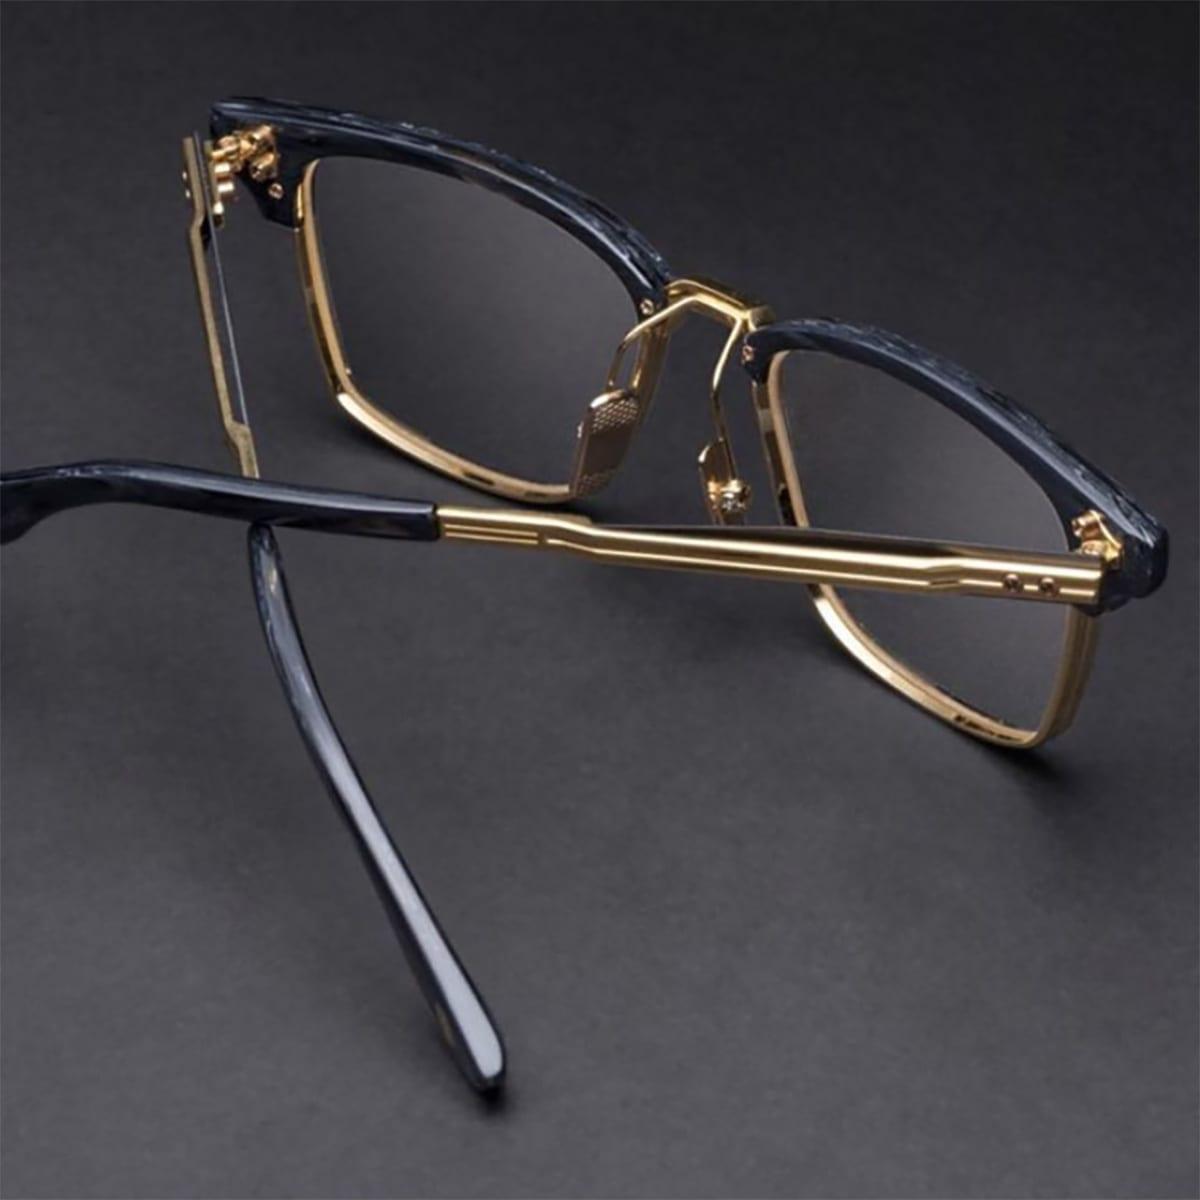 dita-eyewear-stockist-wolverhampton-shropshire-west-midlands-4